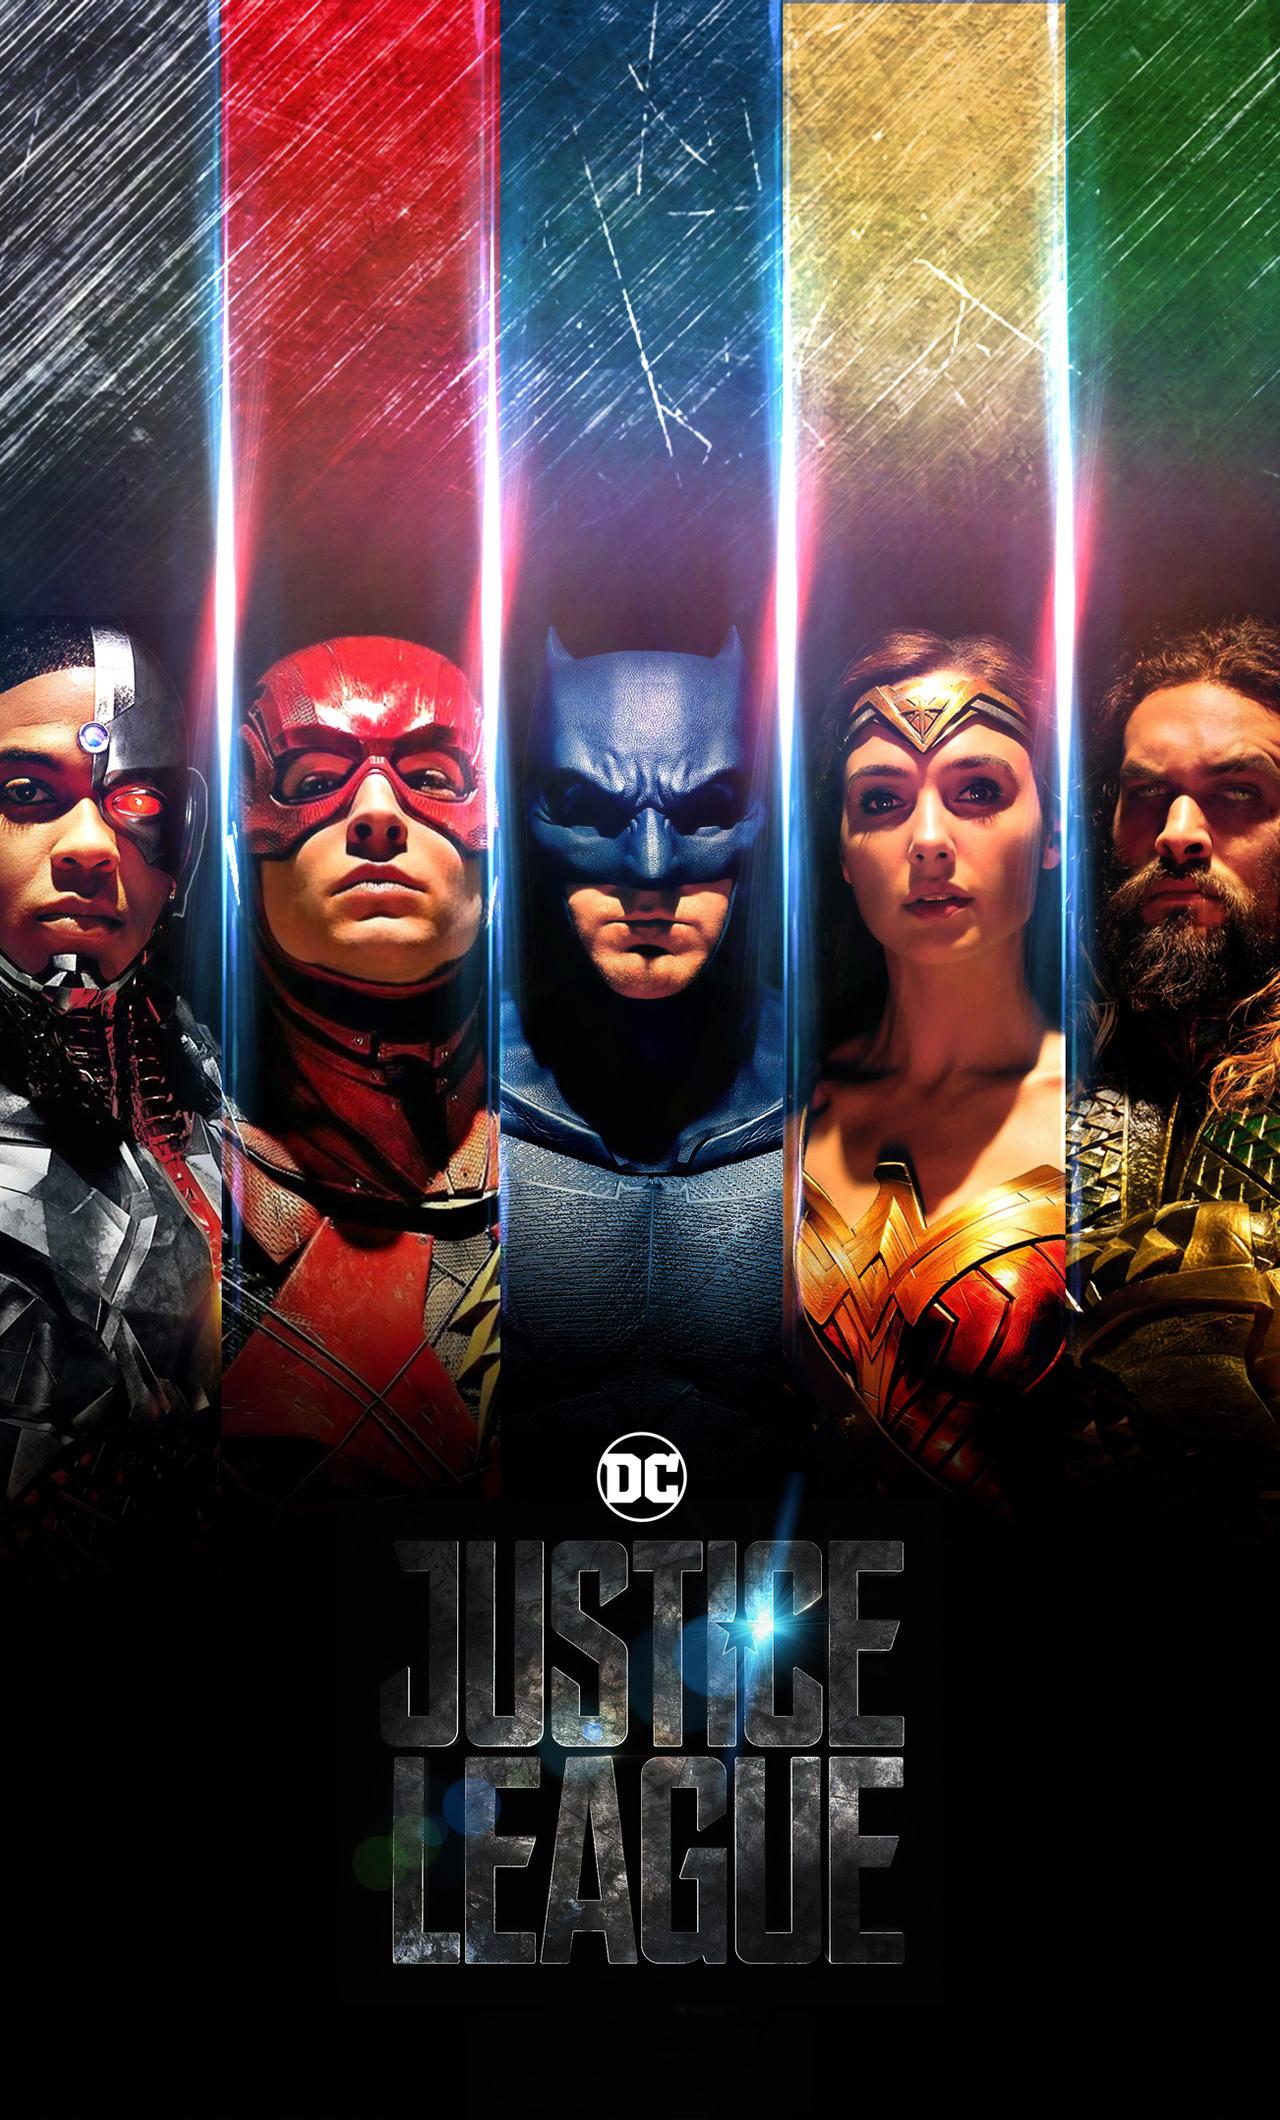 justice-league-superhero-x5.jpg